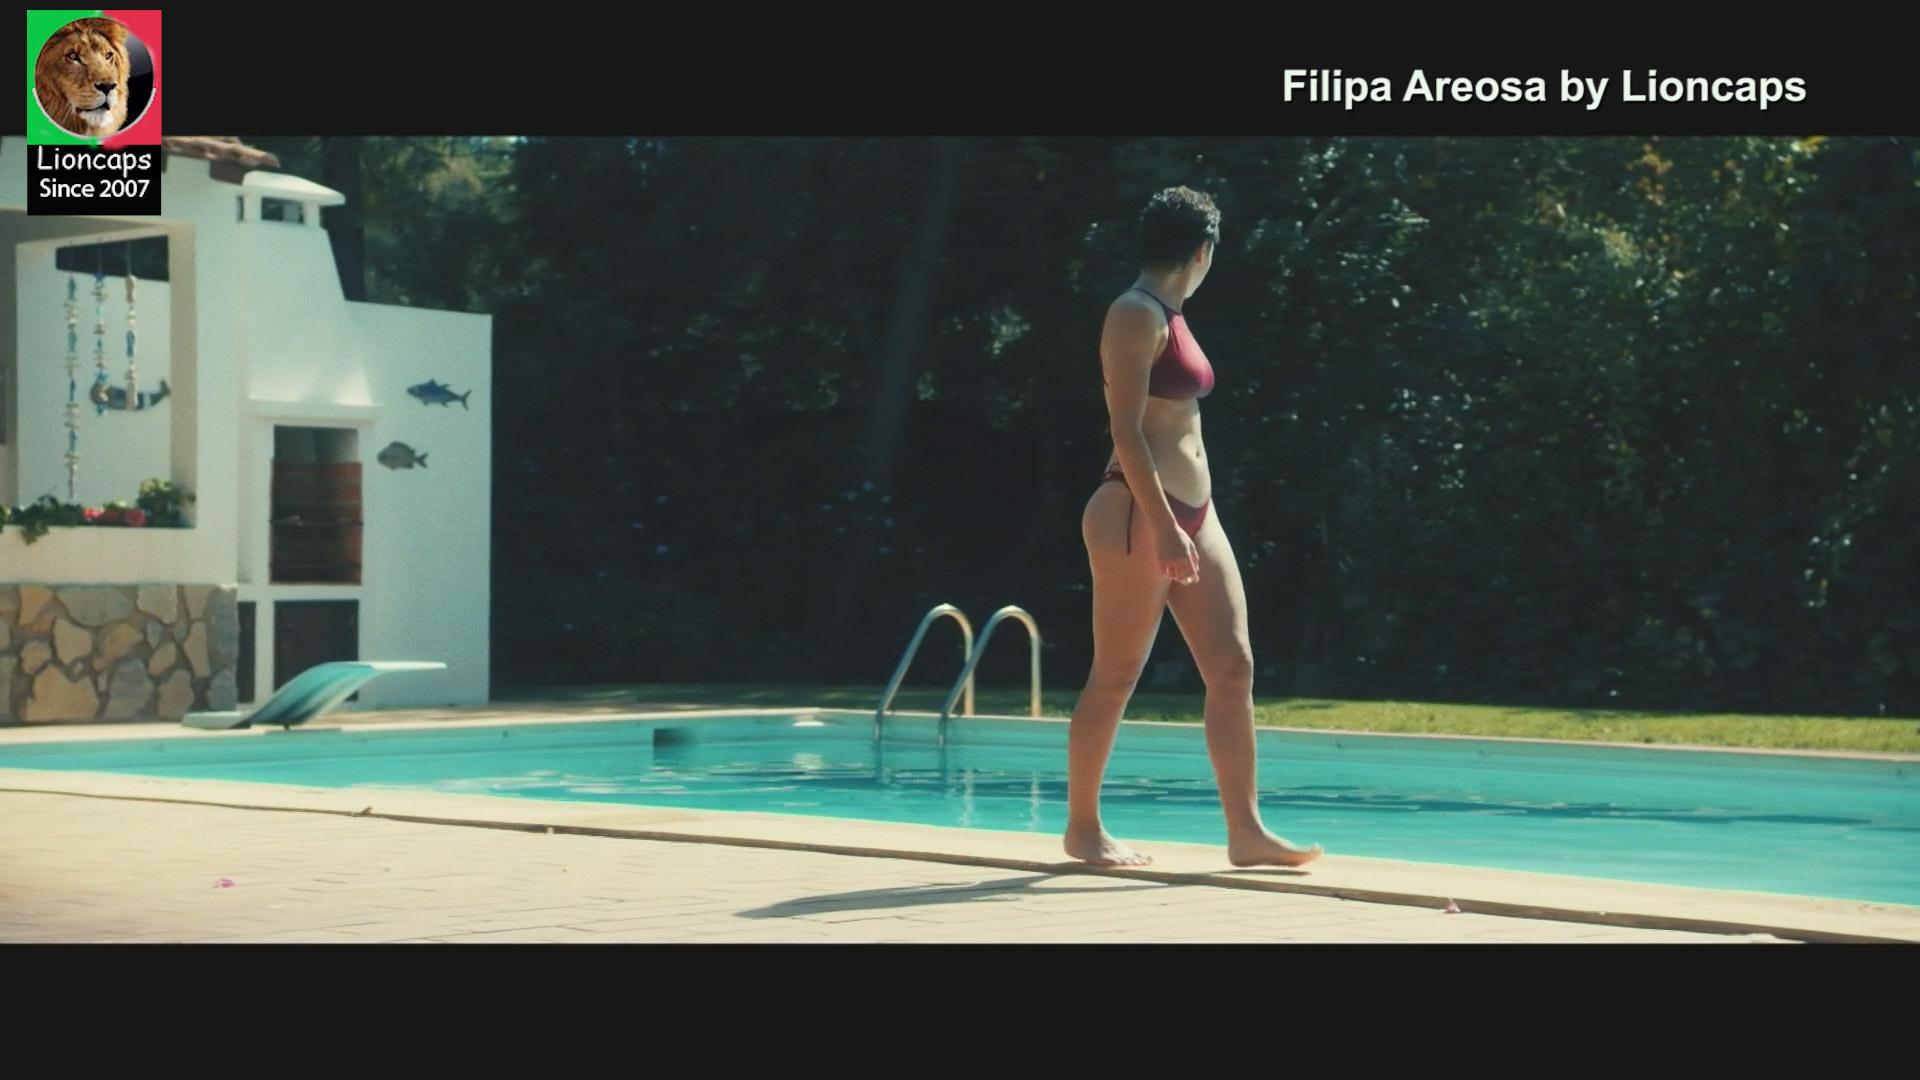 filipa_areosa (14).jpg